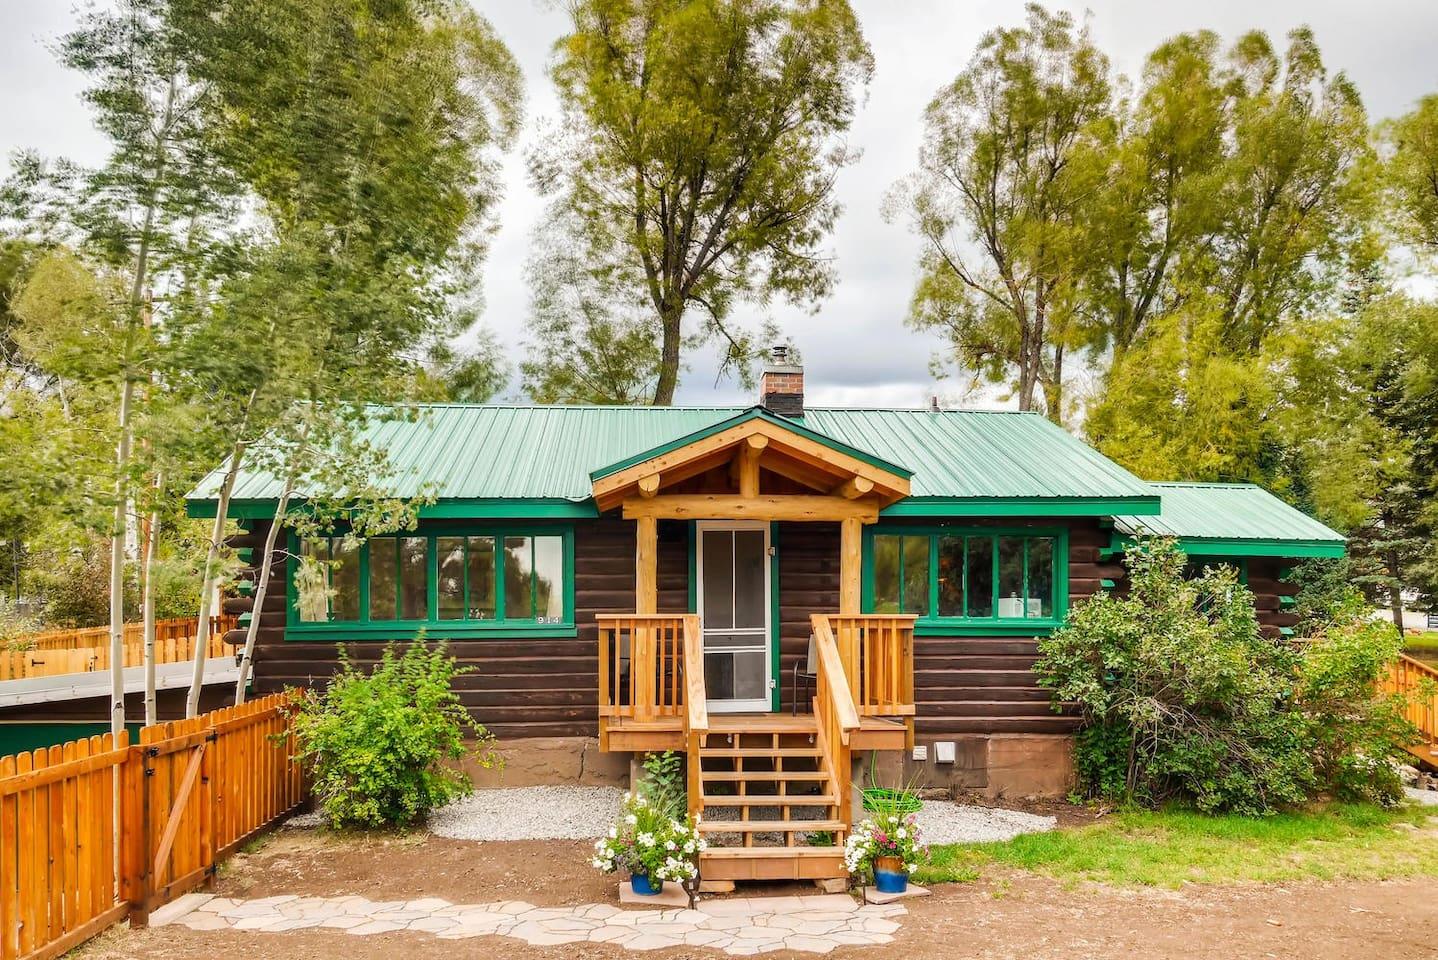 Wonderfully restored historic Old Town Log Cabin with big back deck & huge fenced yard